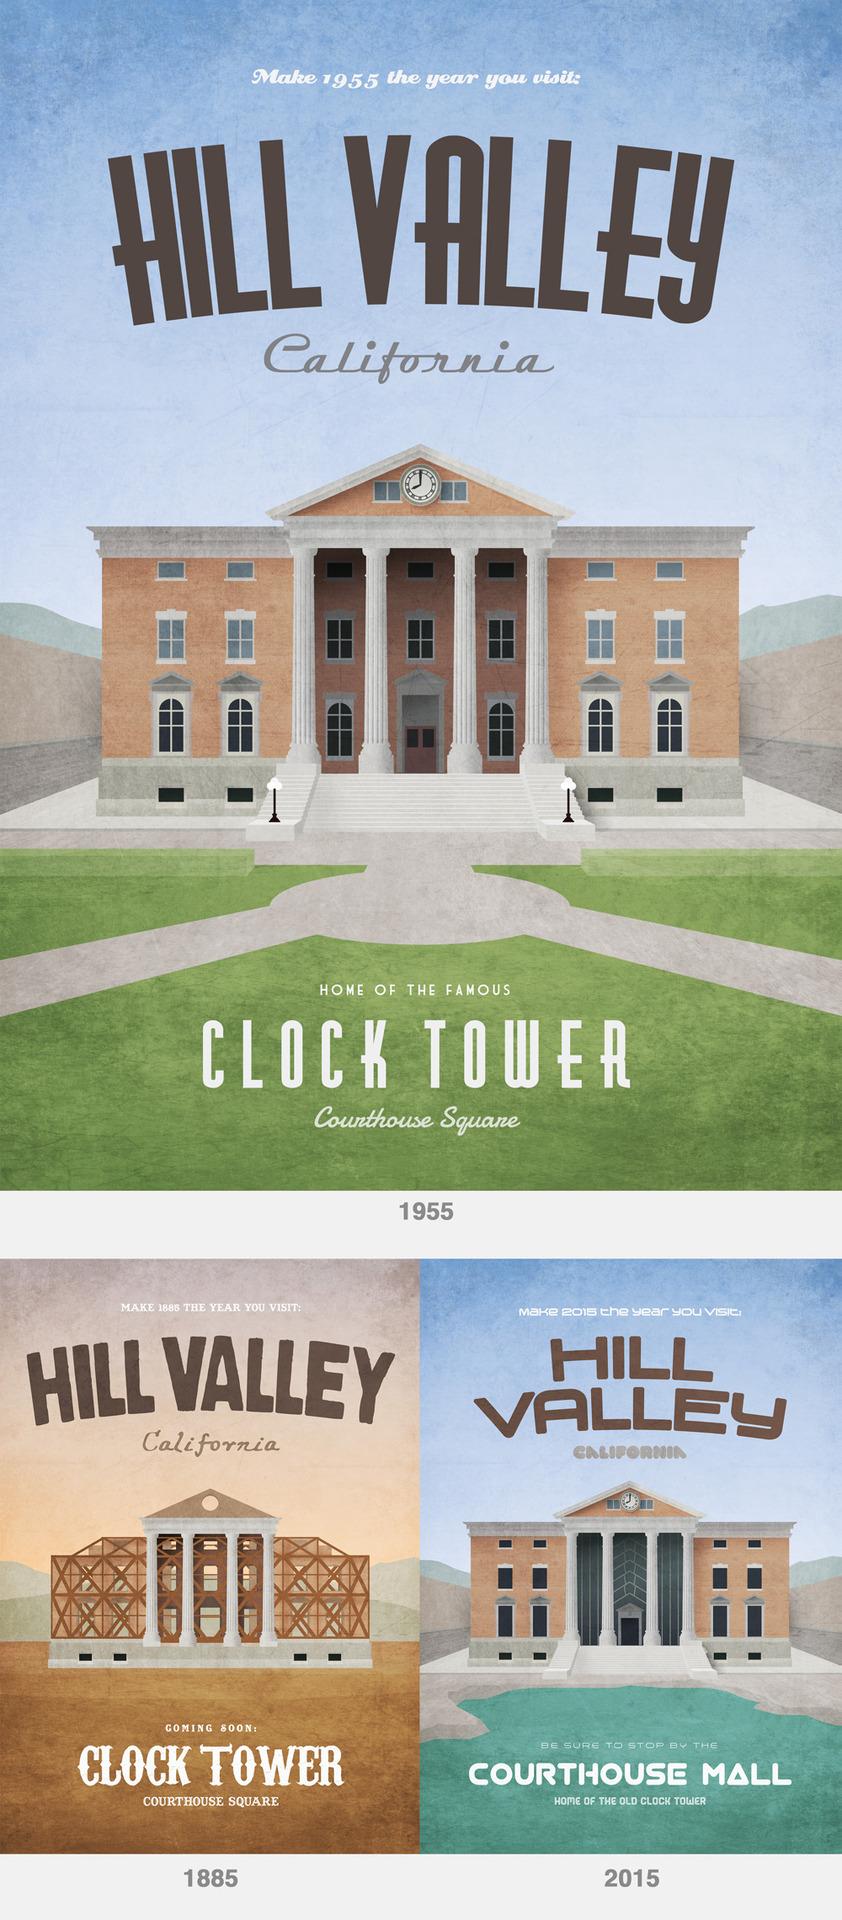 hill-valley-clocktower-bttf.jpeg